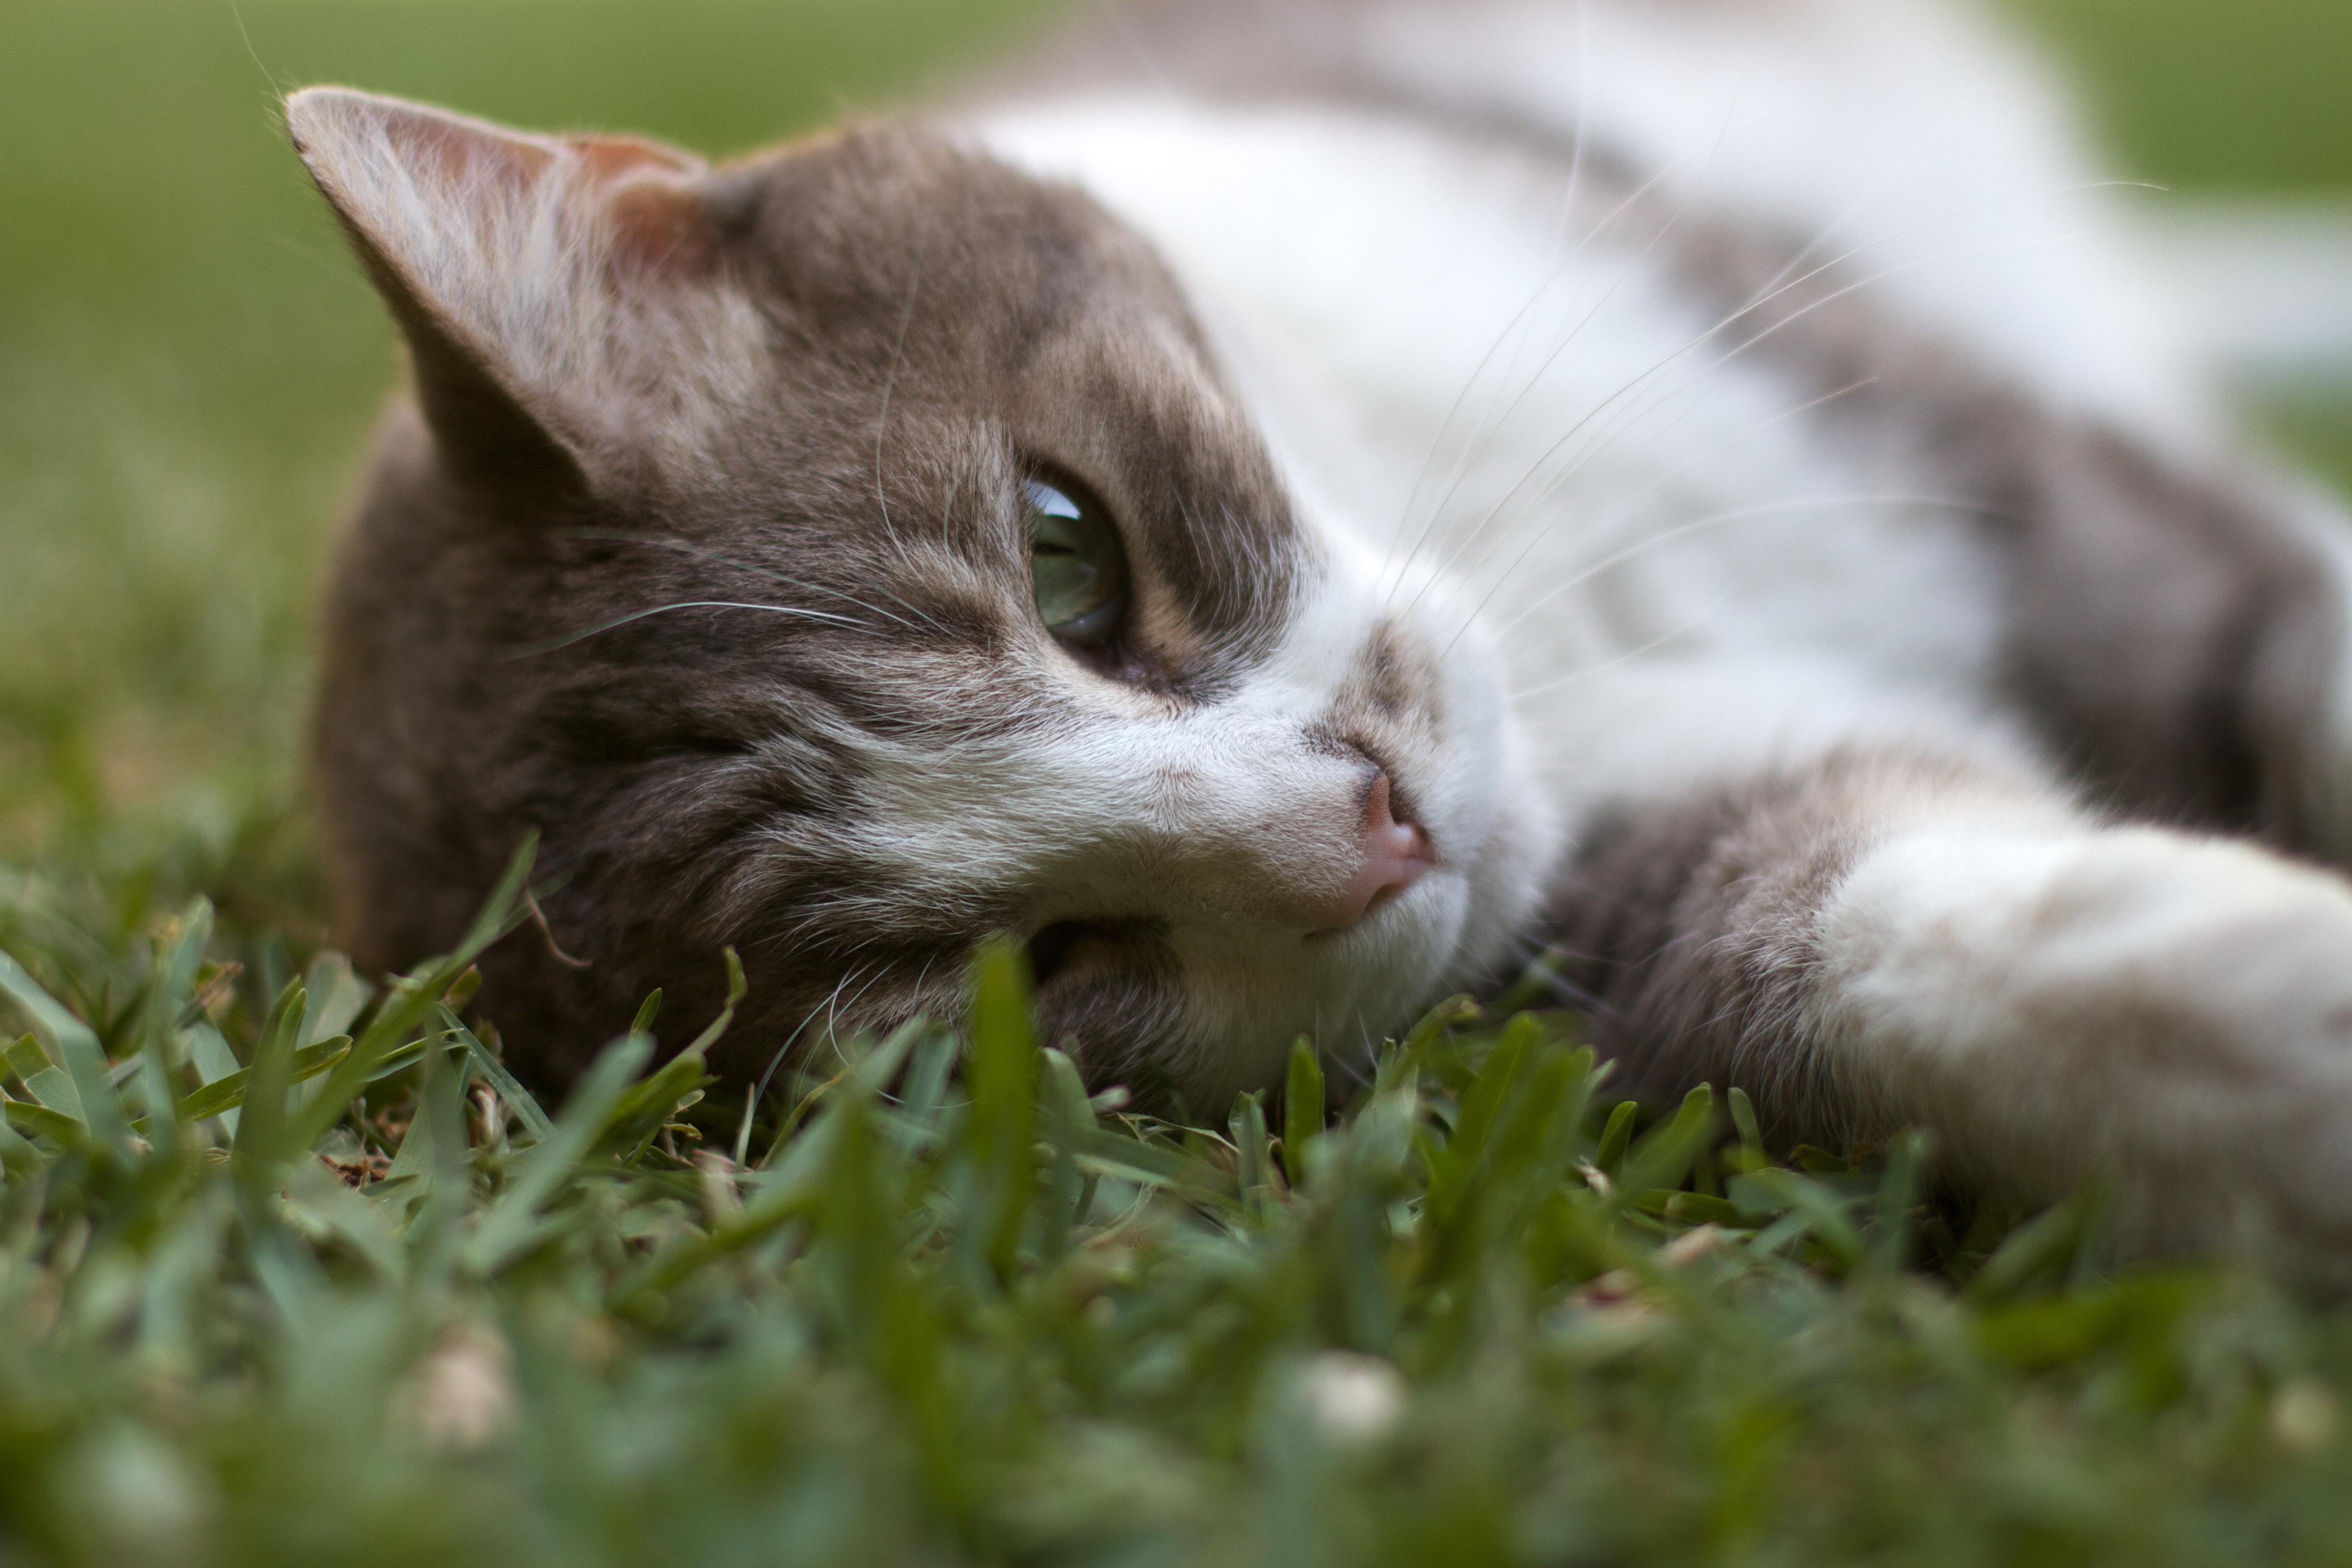 cat picture free, Animals, Cat, Grass, HQ Photo